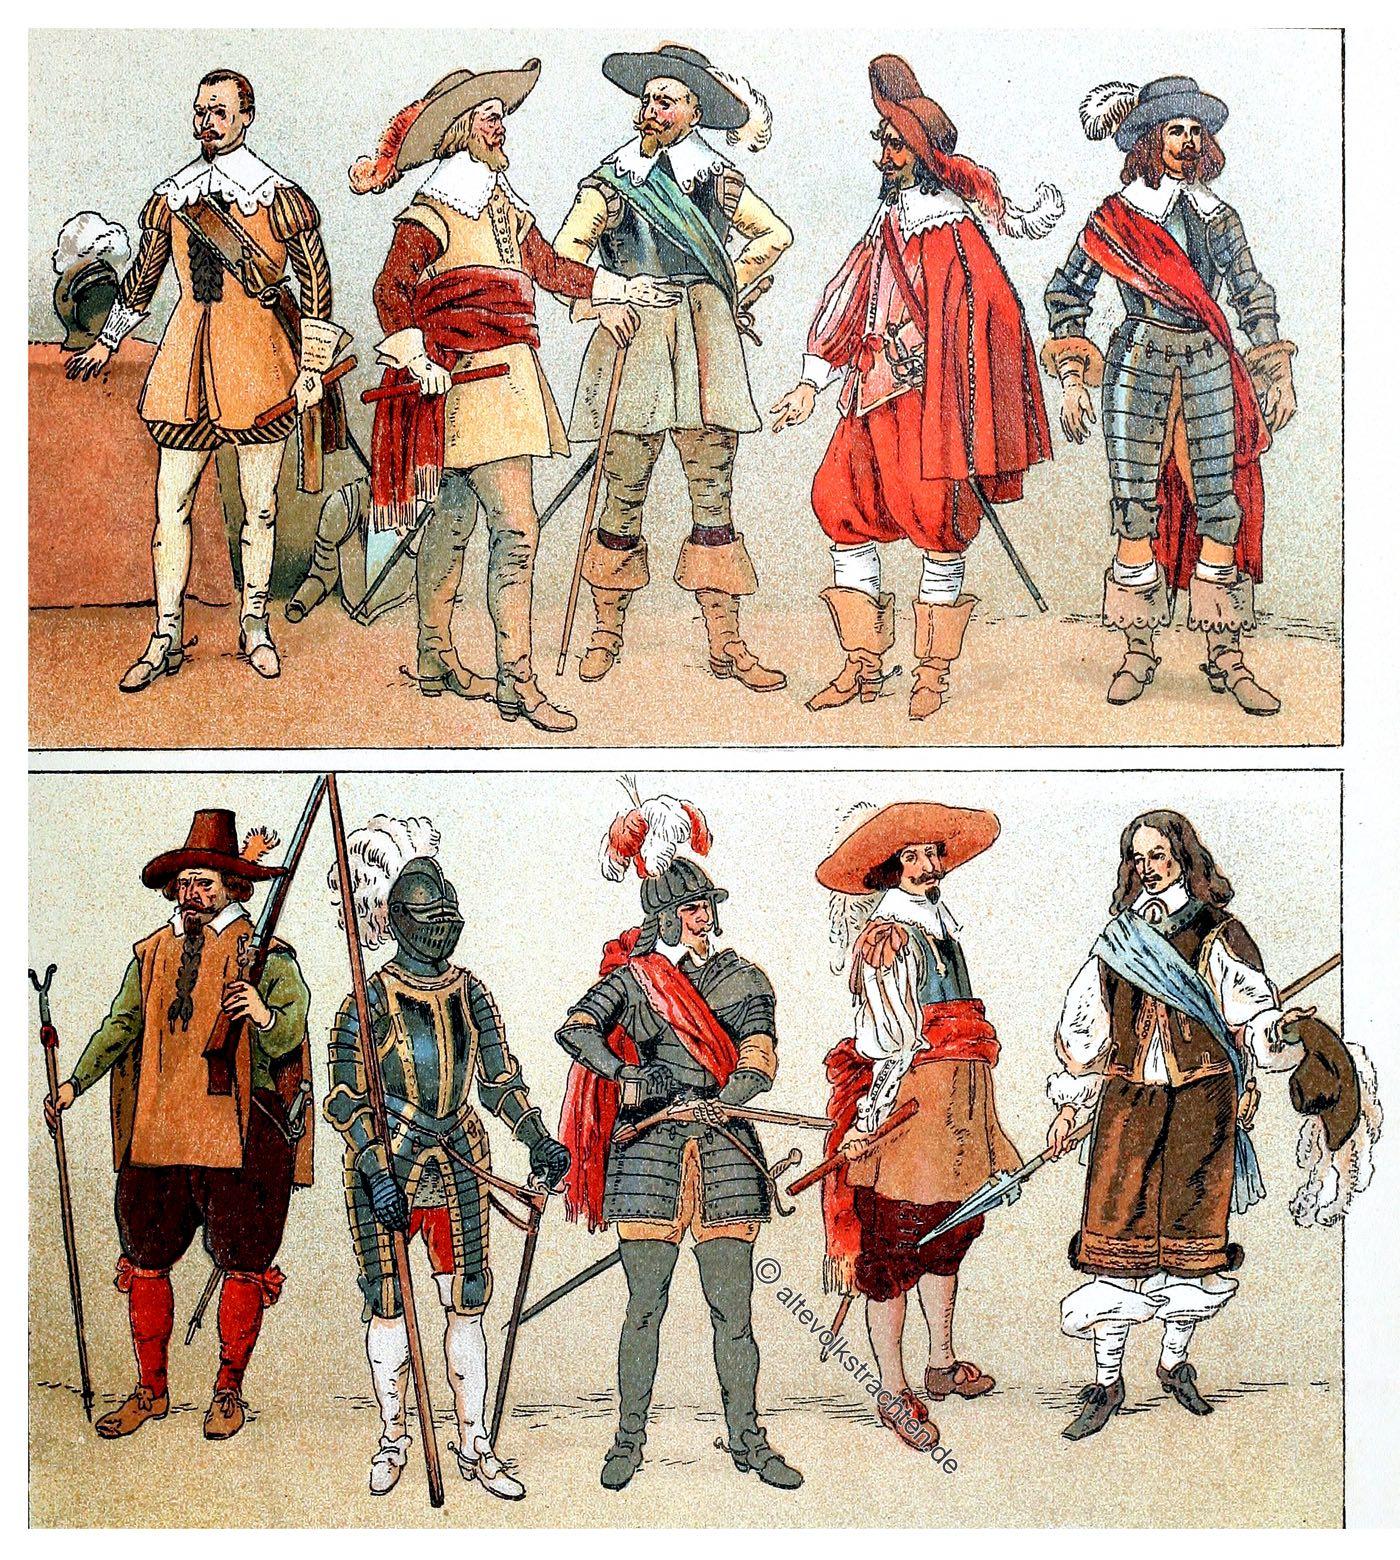 dreissigjähriger Krieg, Soldaten, Barock